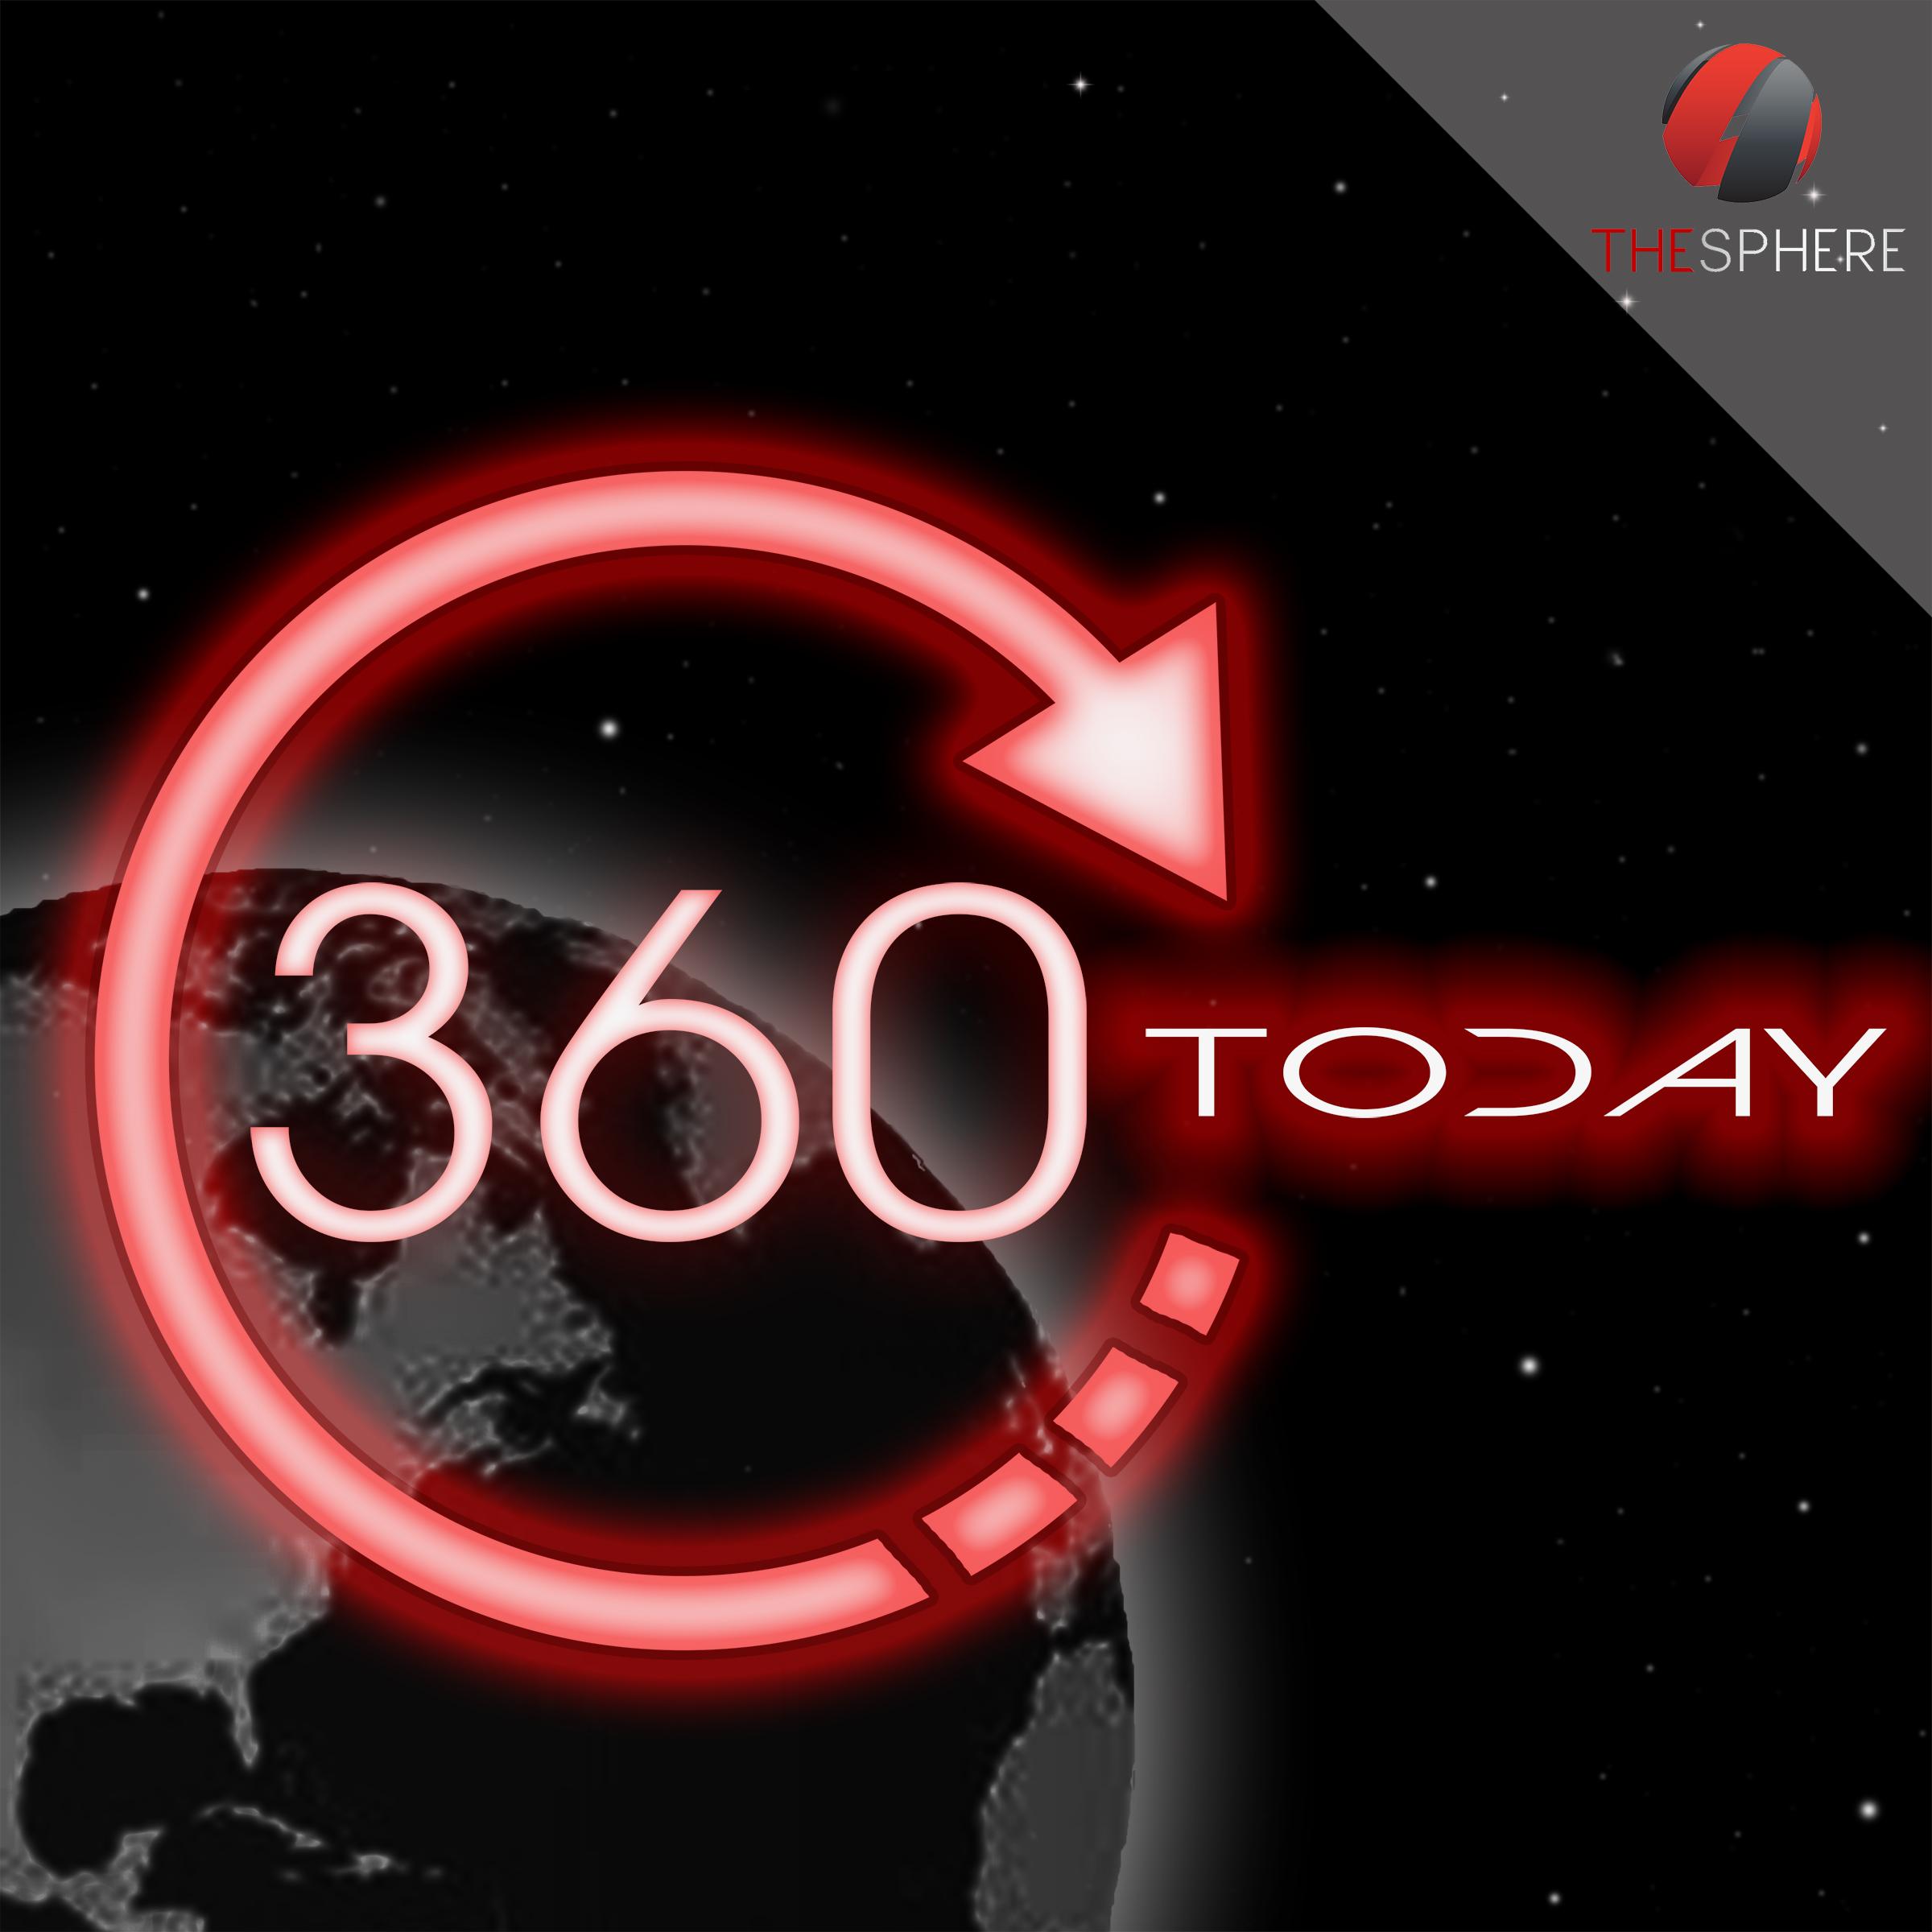 360 Today.jpg